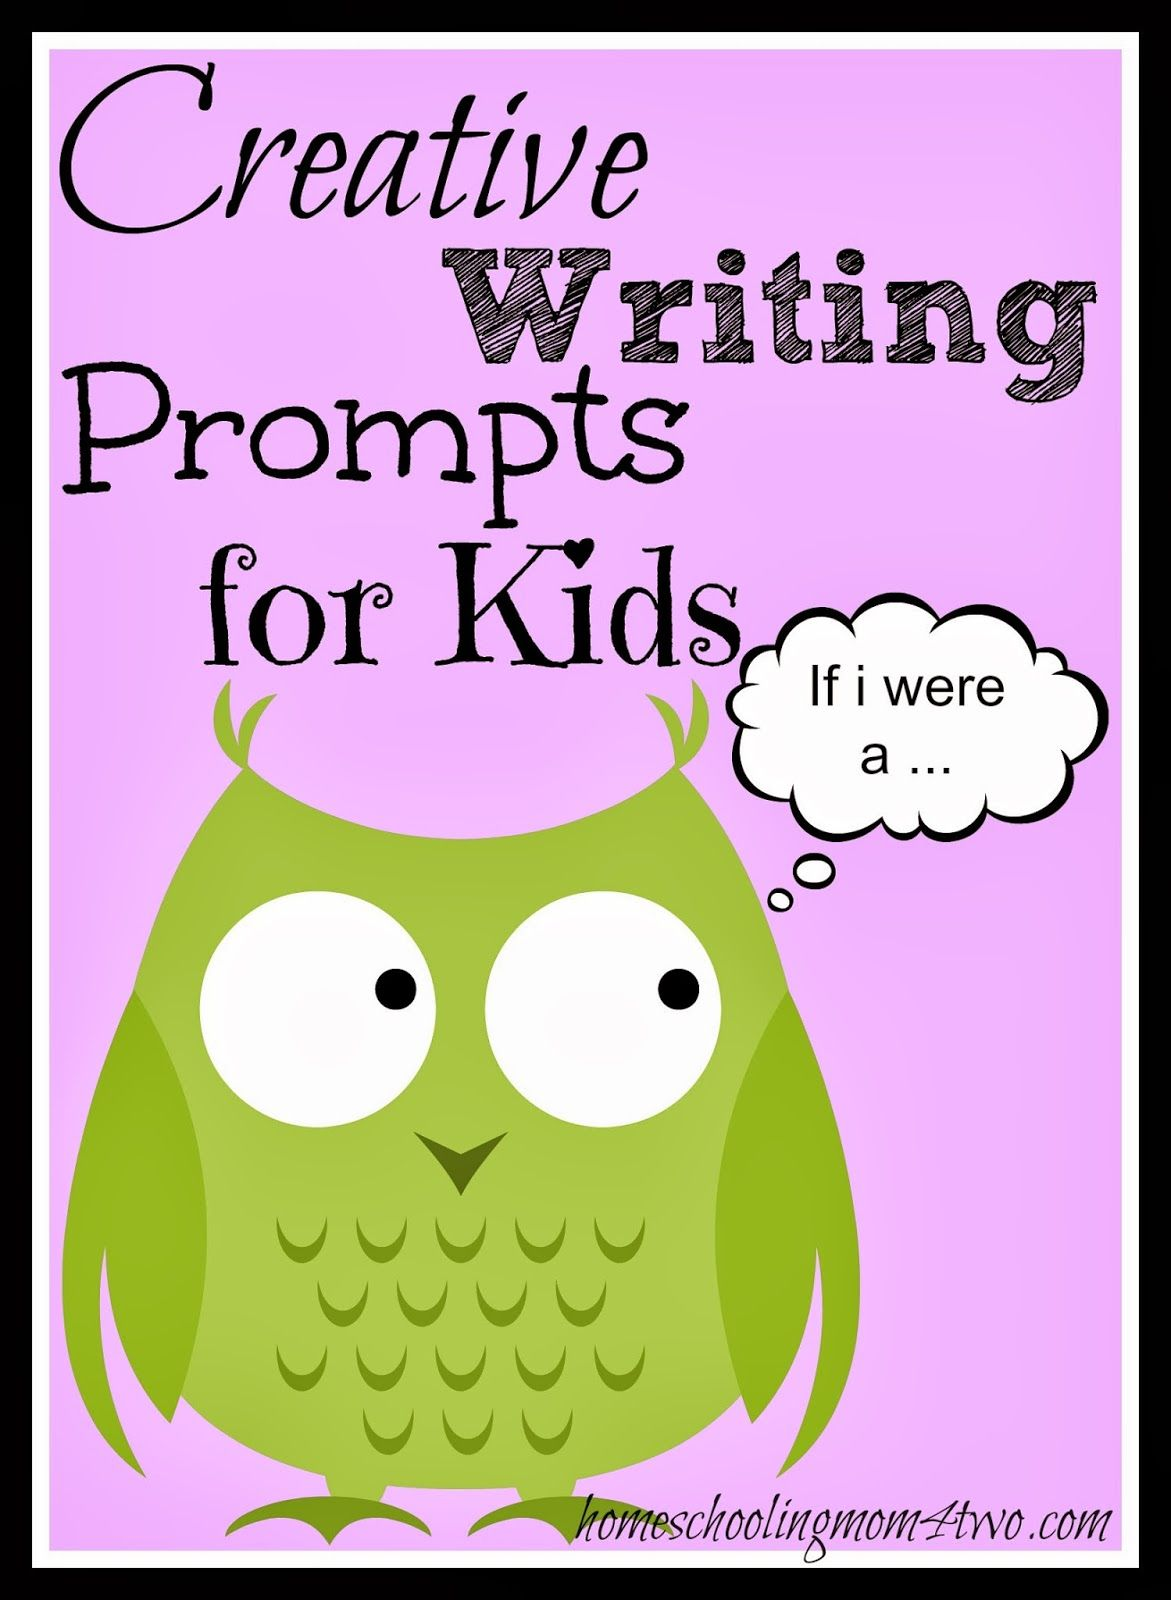 creative writing prompts for kids | homeschool stuff | pinterest